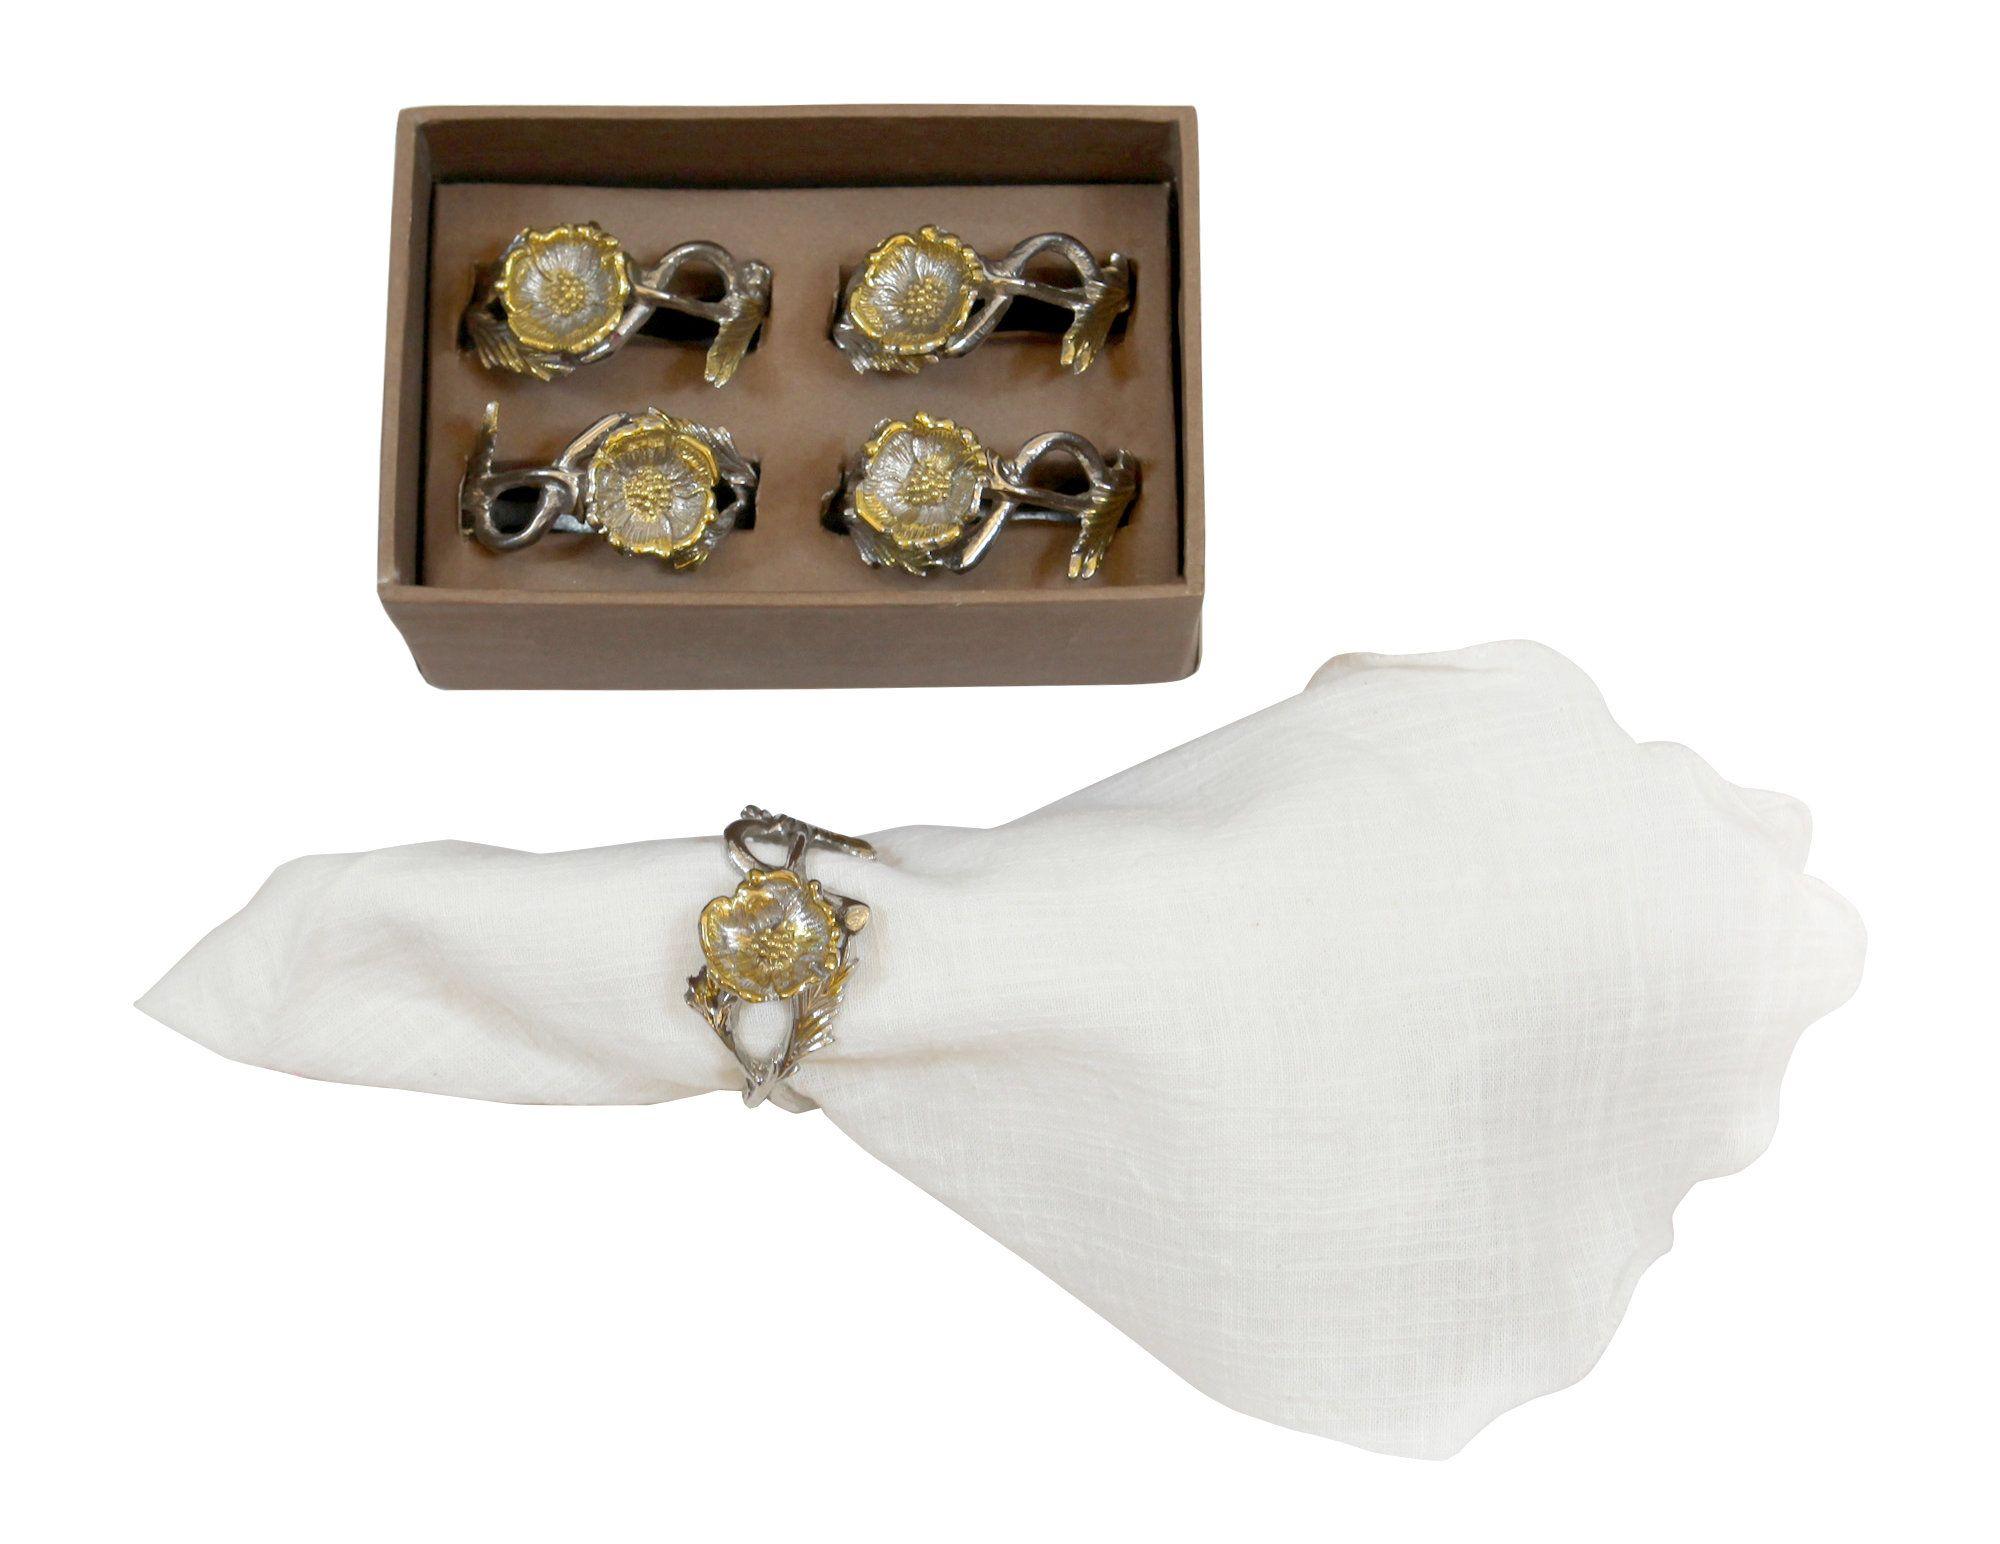 Poppy napkin ring products